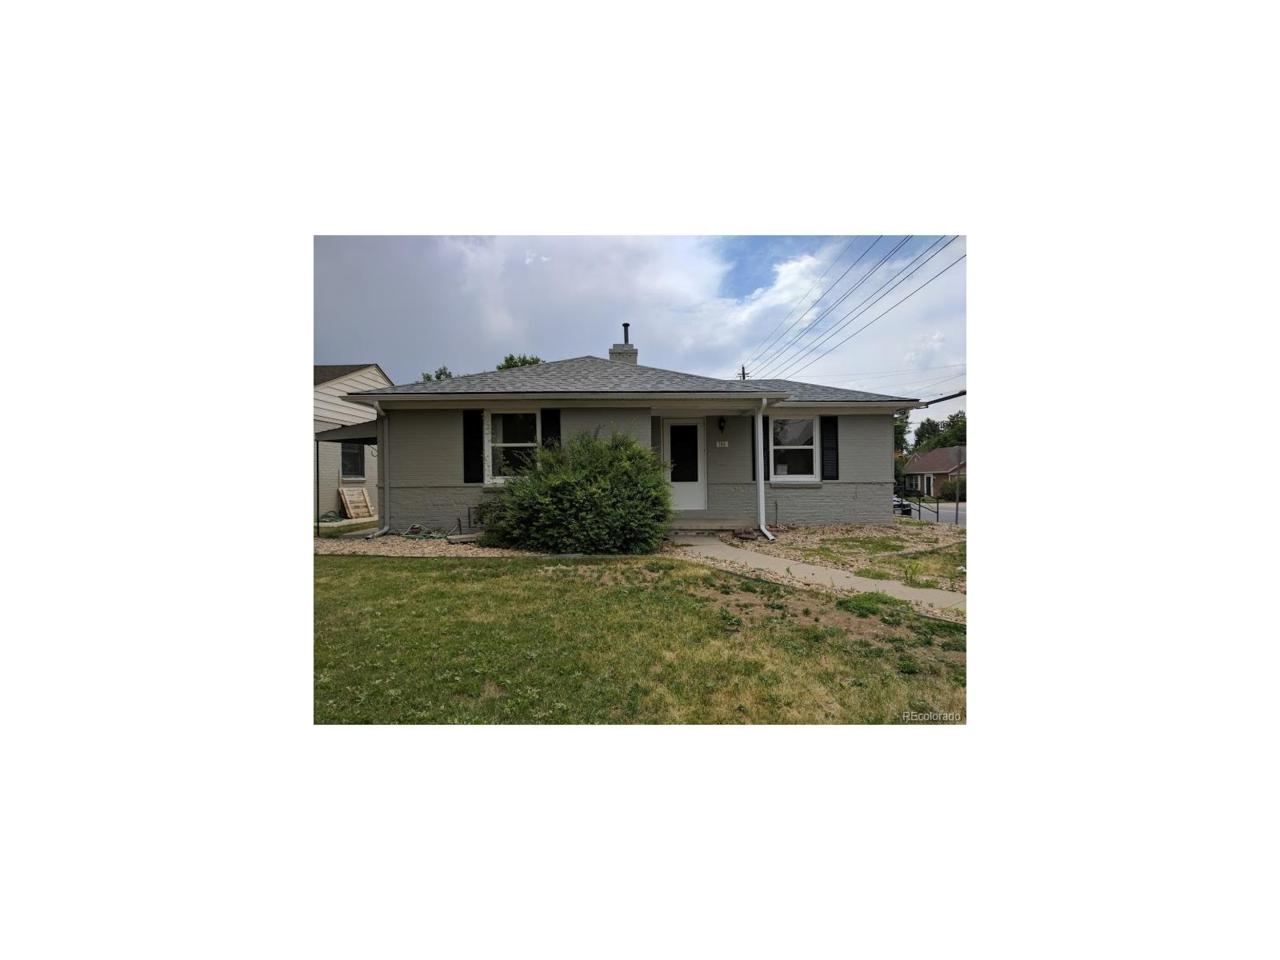 785 N Elm Street, Denver, CO 80220 (MLS #5226153) :: 8z Real Estate